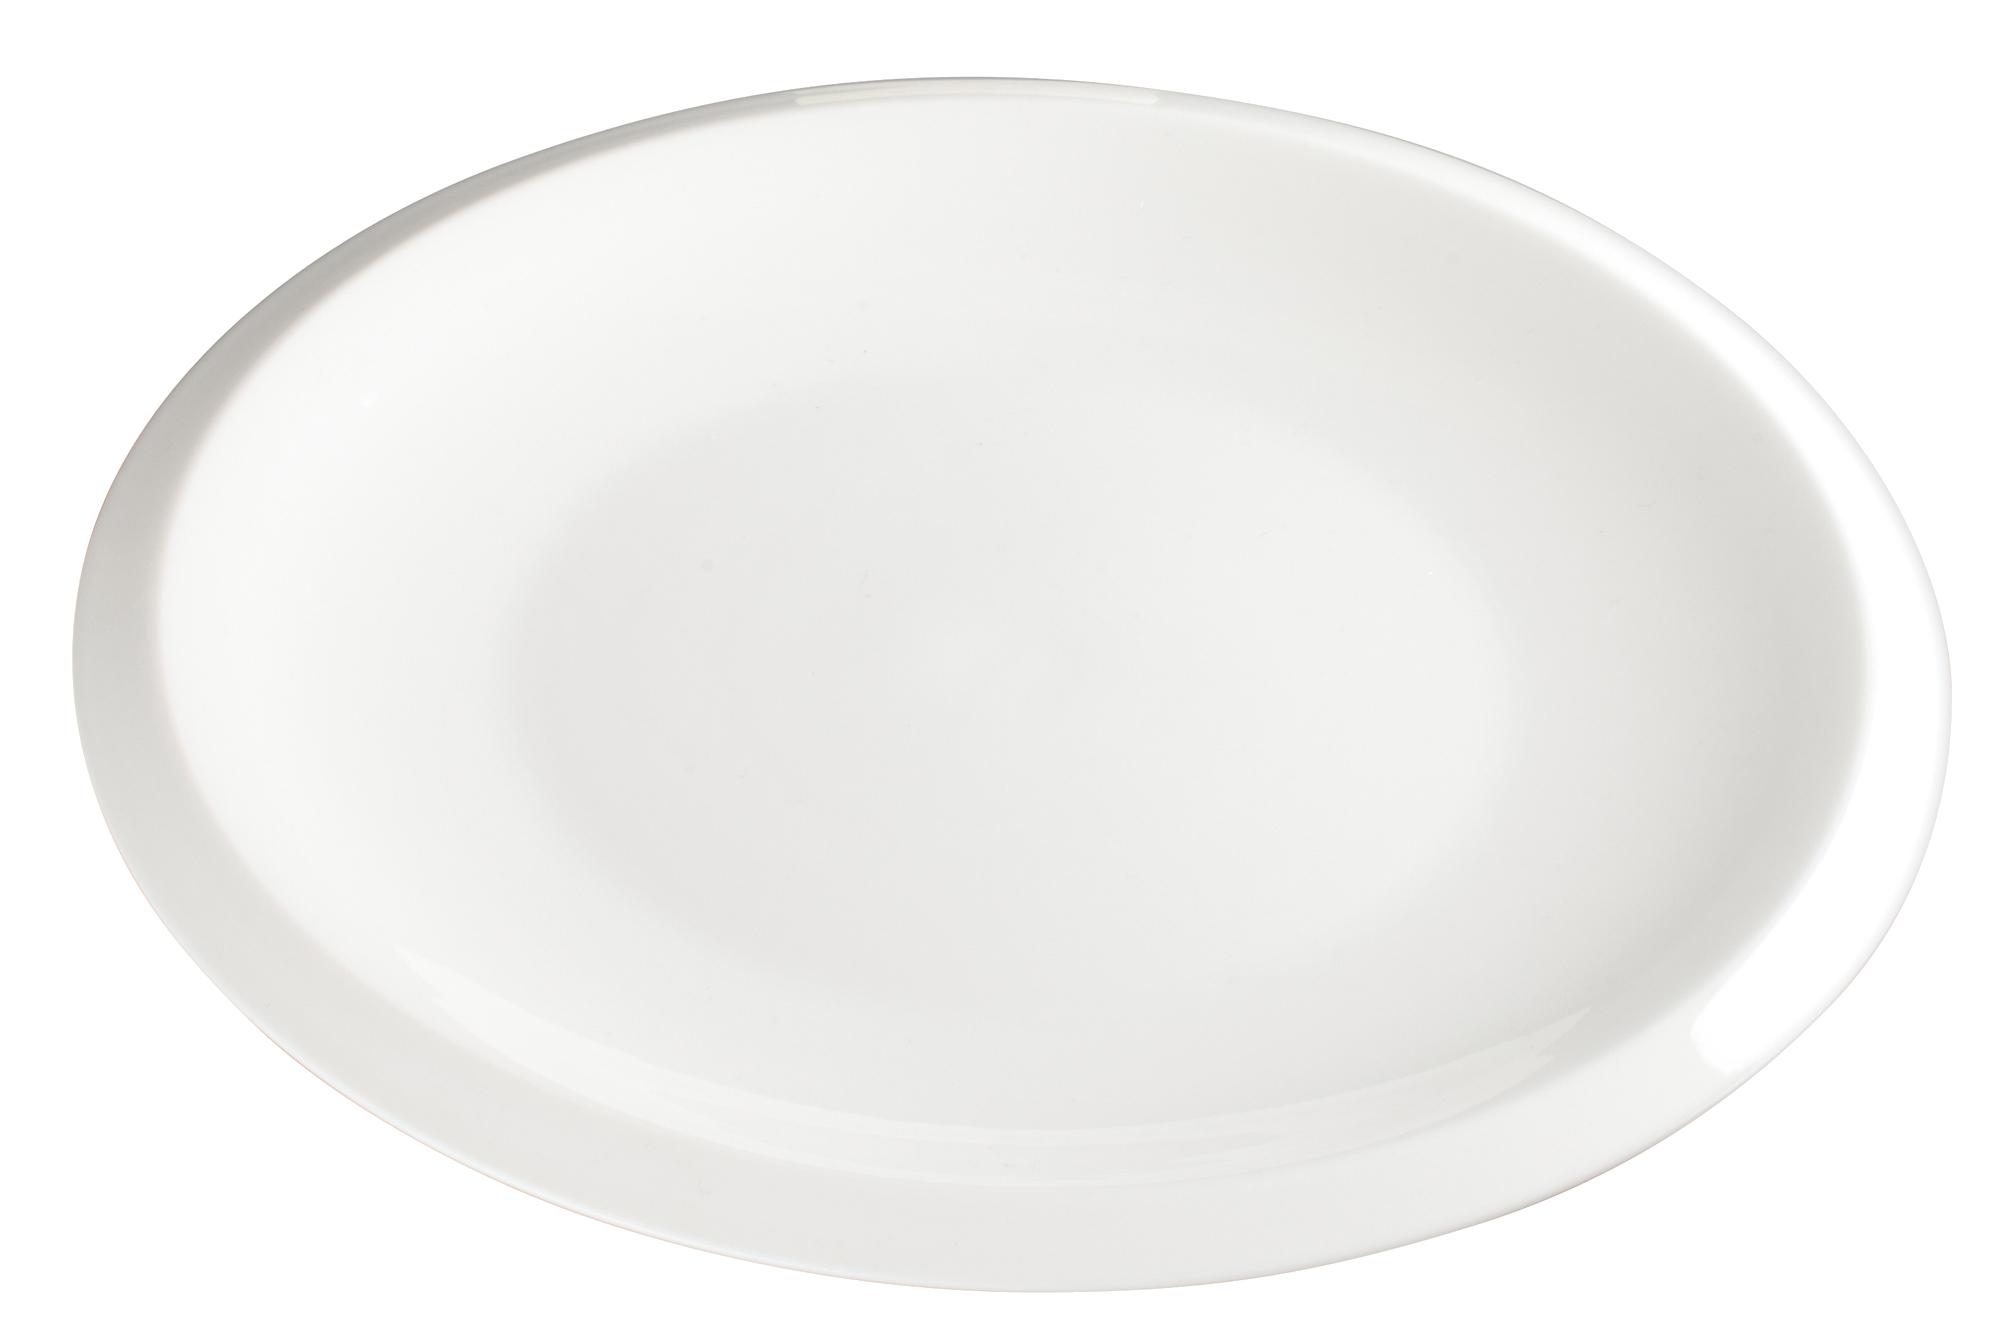 Winco WDP006-202 plate, china